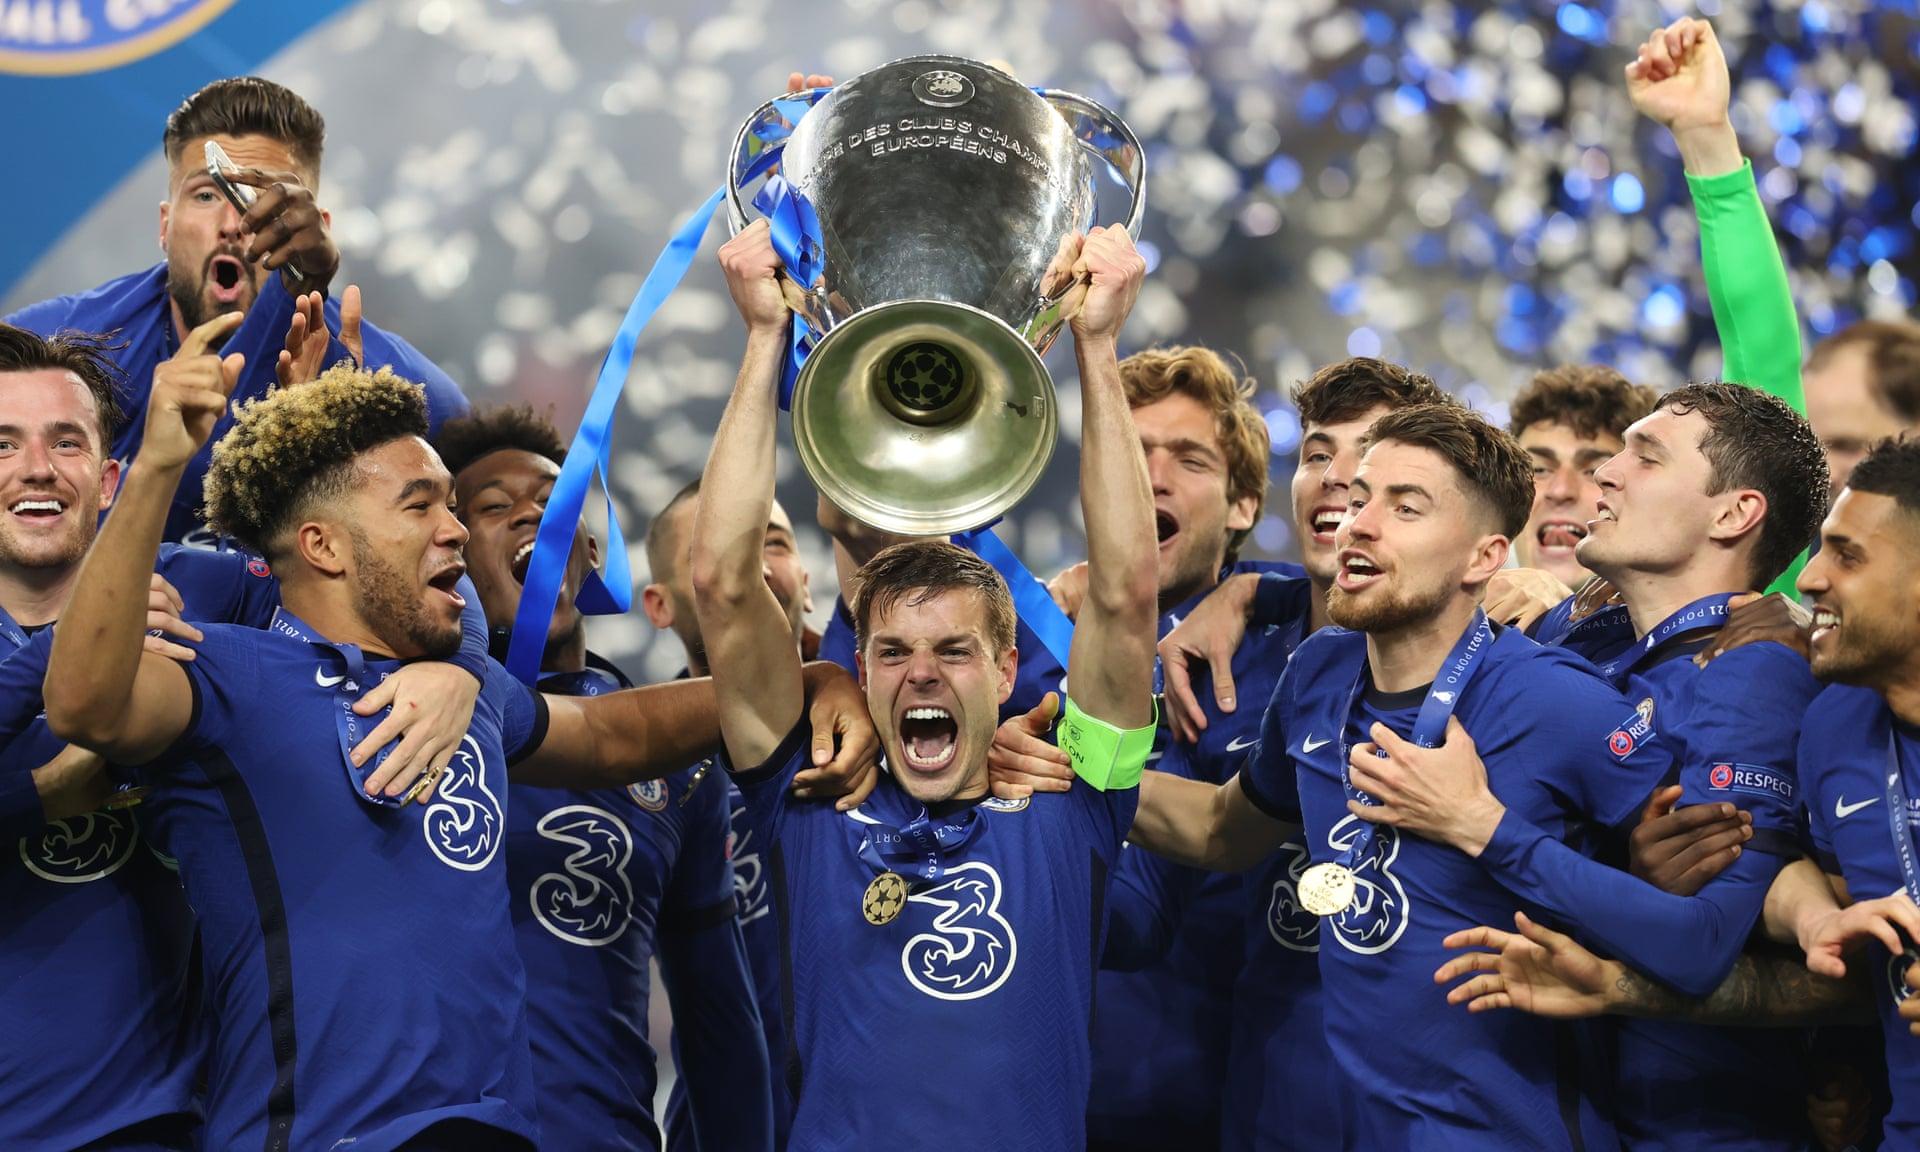 Azpilicueta nâng danh hiệu Champions League 2020-2021. Ảnh: UEFA